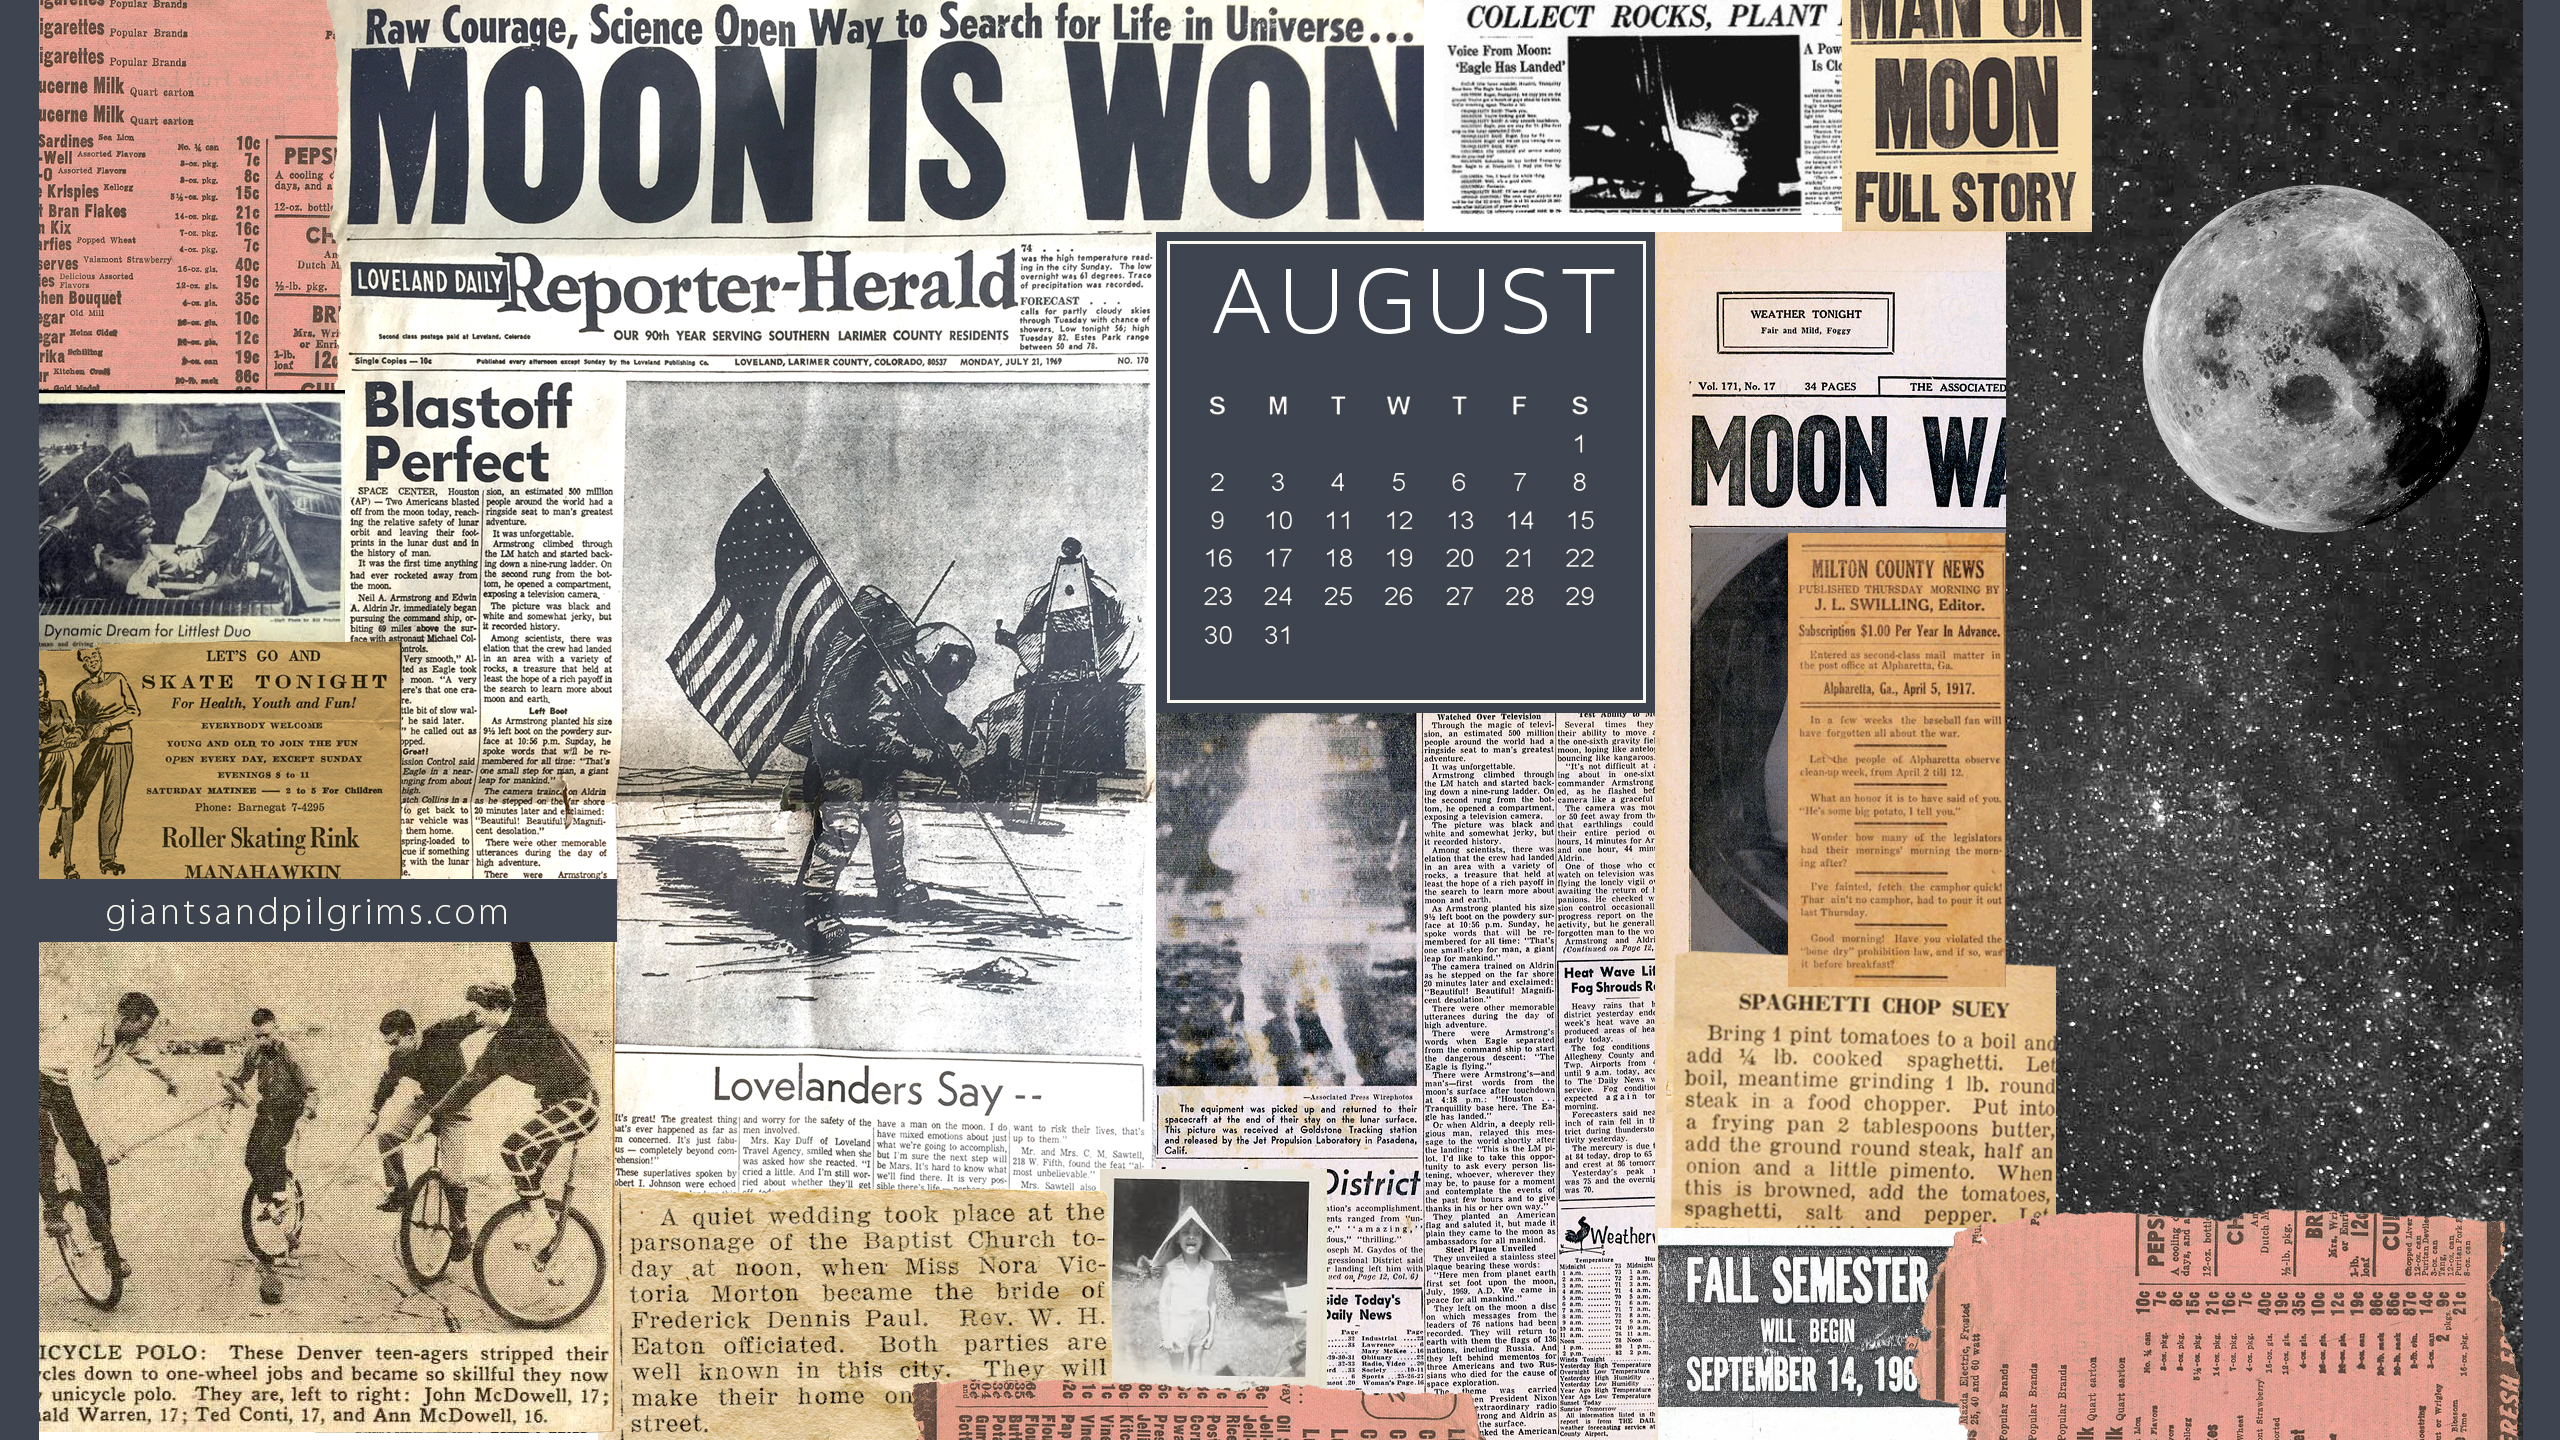 August Calendar Desktop and iPhone Wallpaper Giants Pilgrims 2560x1440